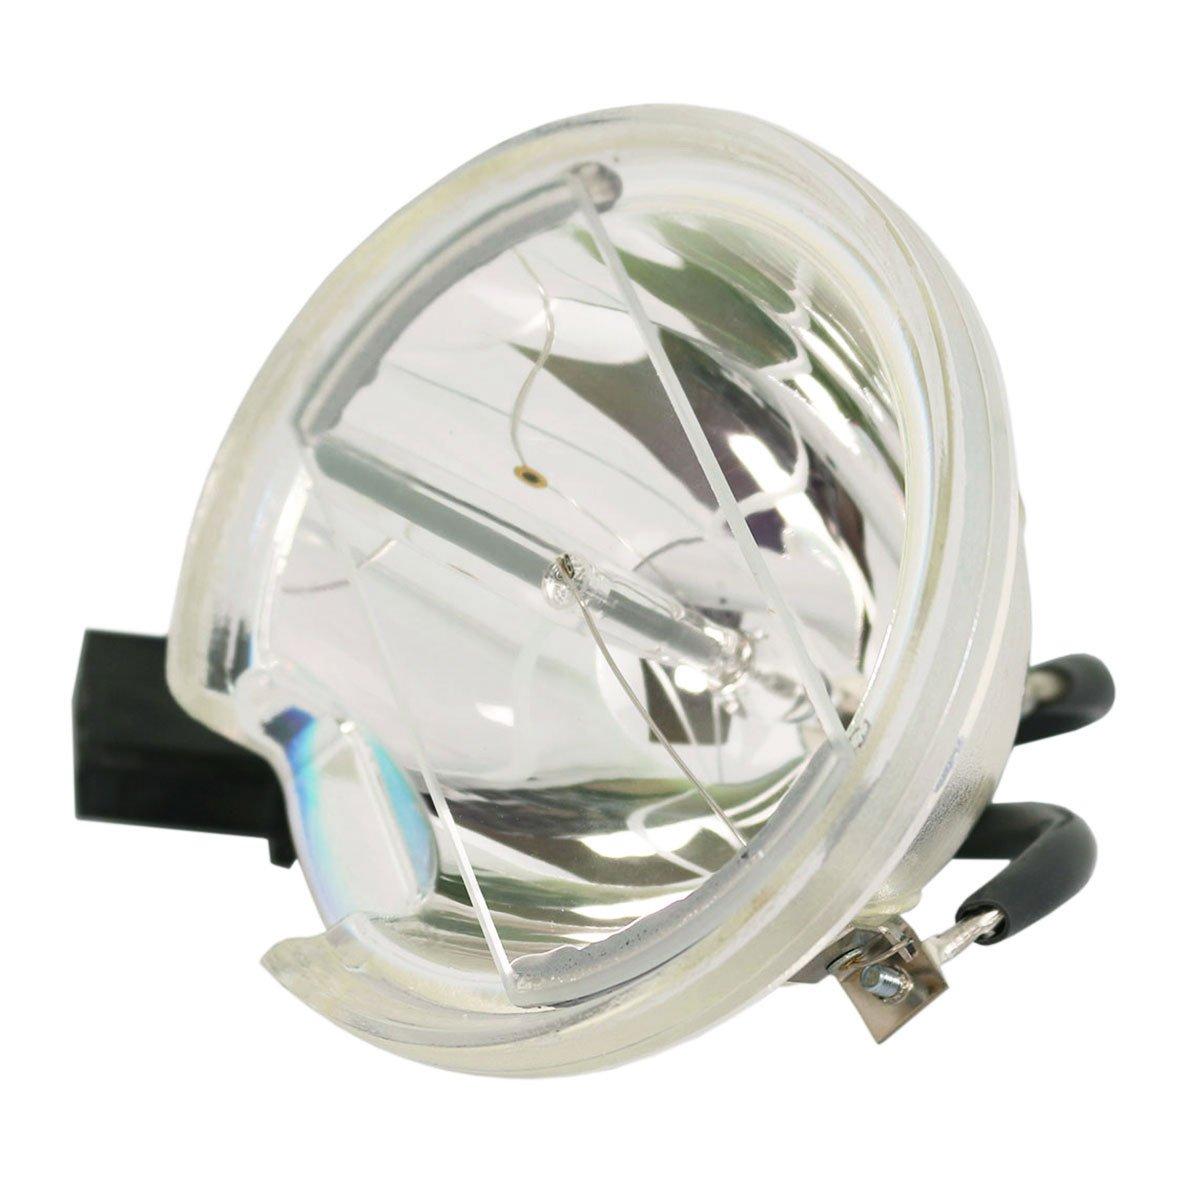 Lutema OEM 交換用ランプ ハウジング/電球付き 東芝 D95-LMP用 Economy Economy Lamp Only B07KTKXNHP